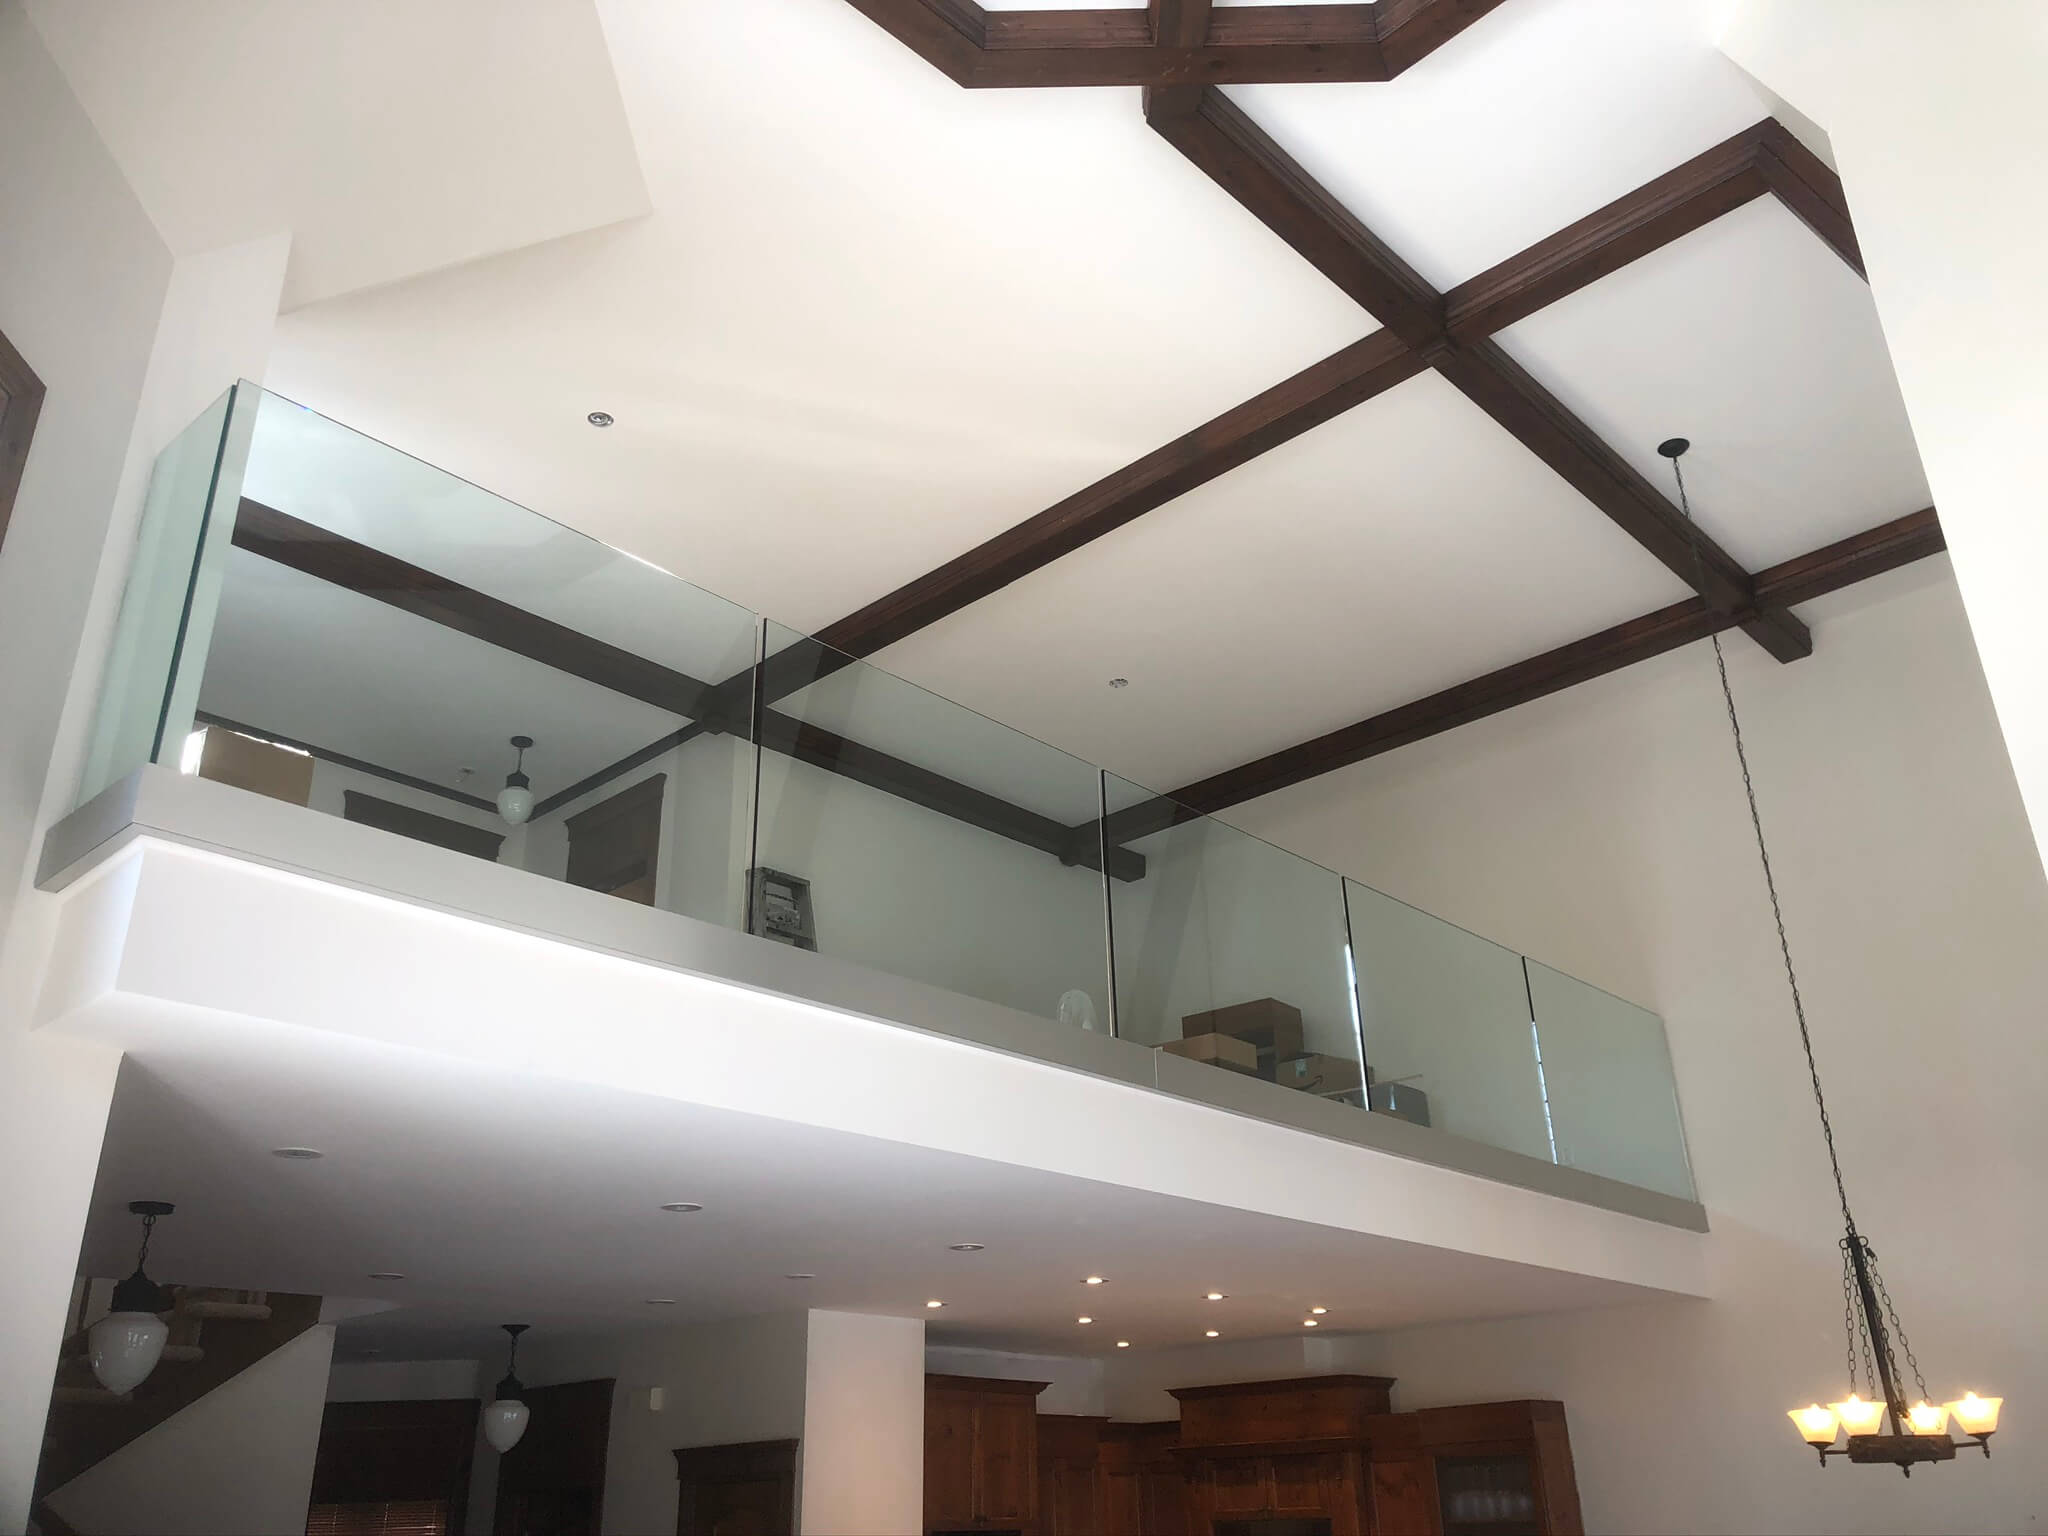 interior mezzanine glass railing 02